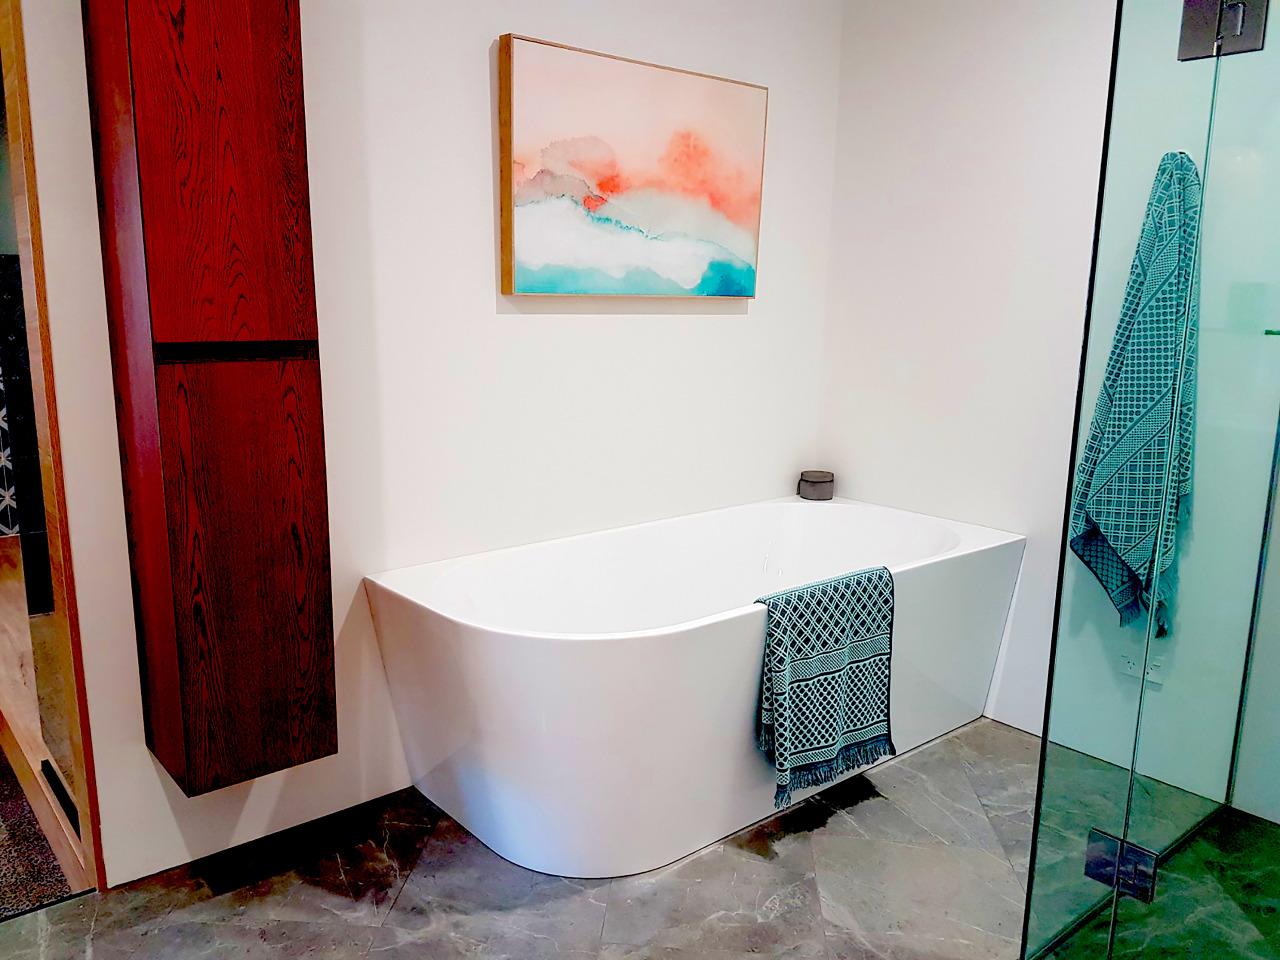 Corner bath tub as seen by Newtech Bathroomware bathroom, floor, flooring, interior design, plumbing fixture, property, room, tile, white